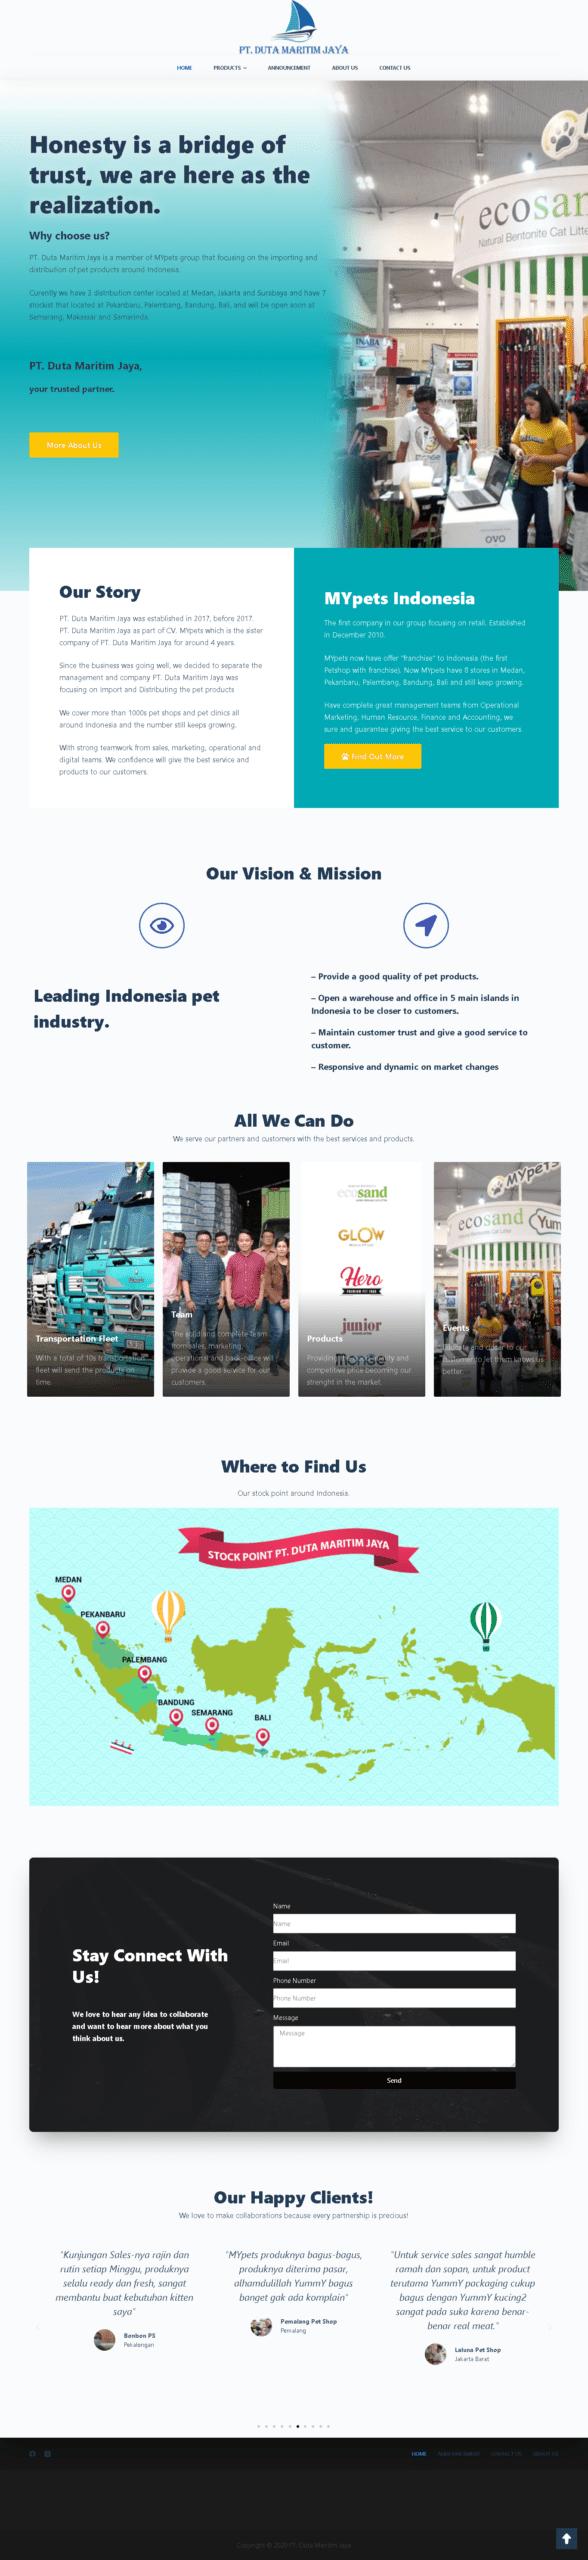 Website Duta Maritim Jaya Medan Indonesia